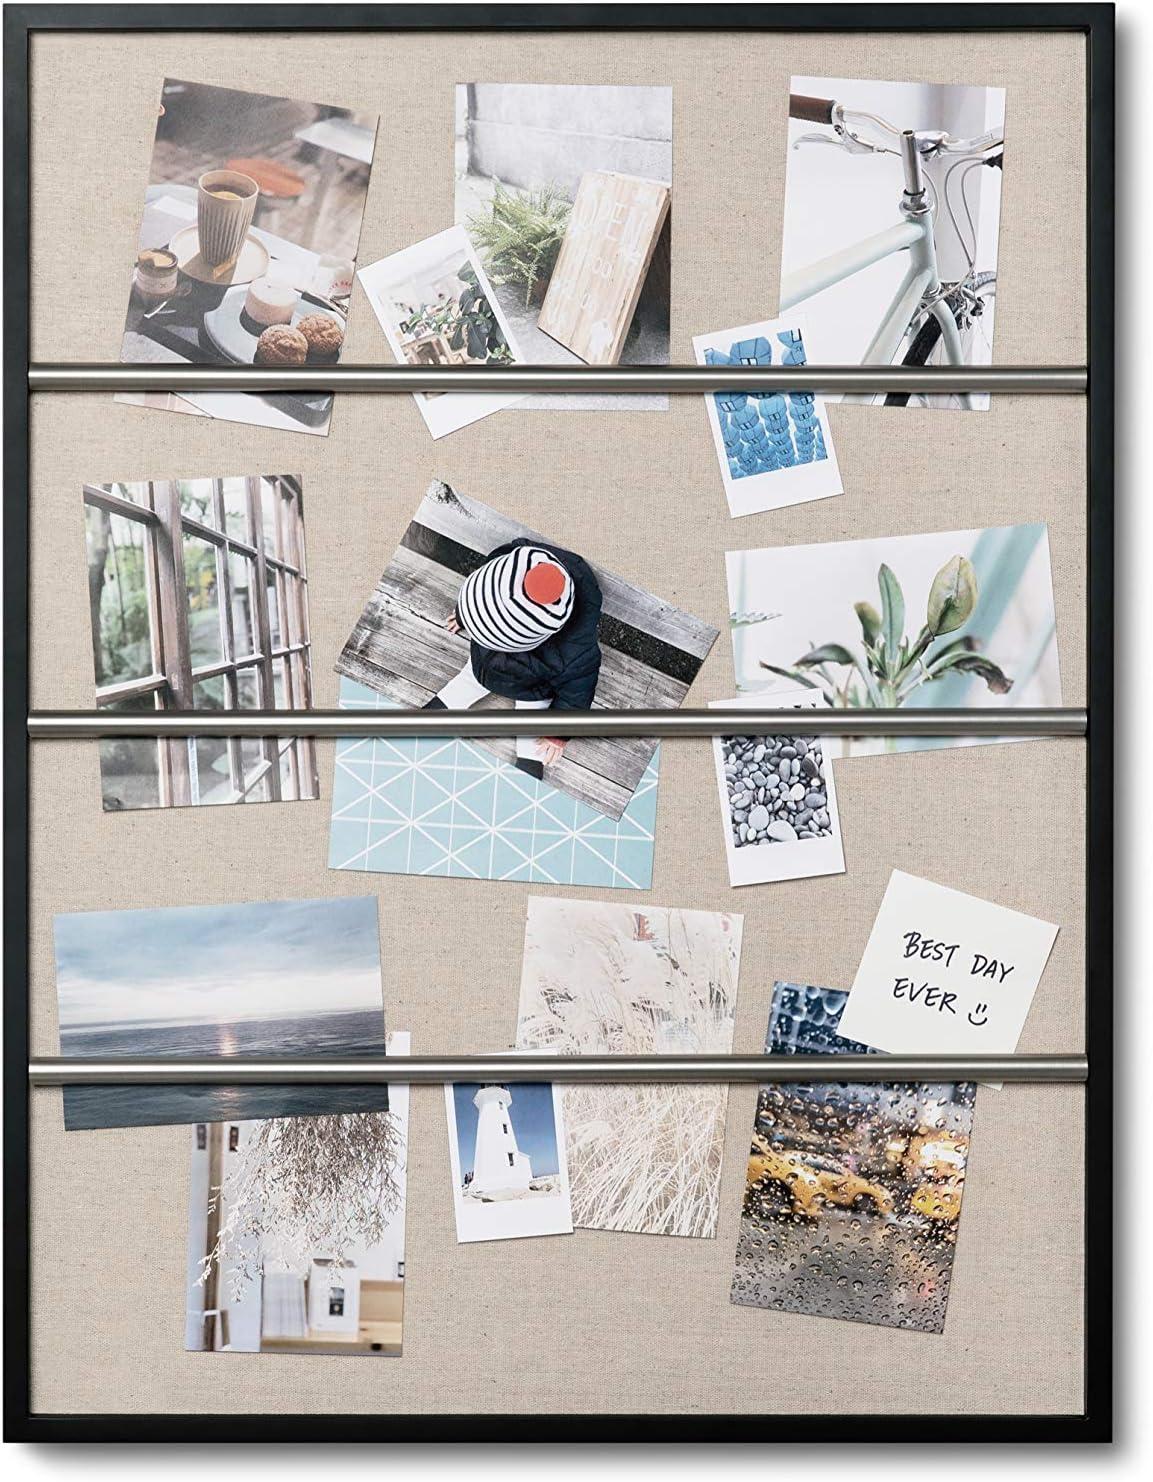 Umbra Tucker Photo Display Decor, Wall Art for Home, Office or Dorm, Black